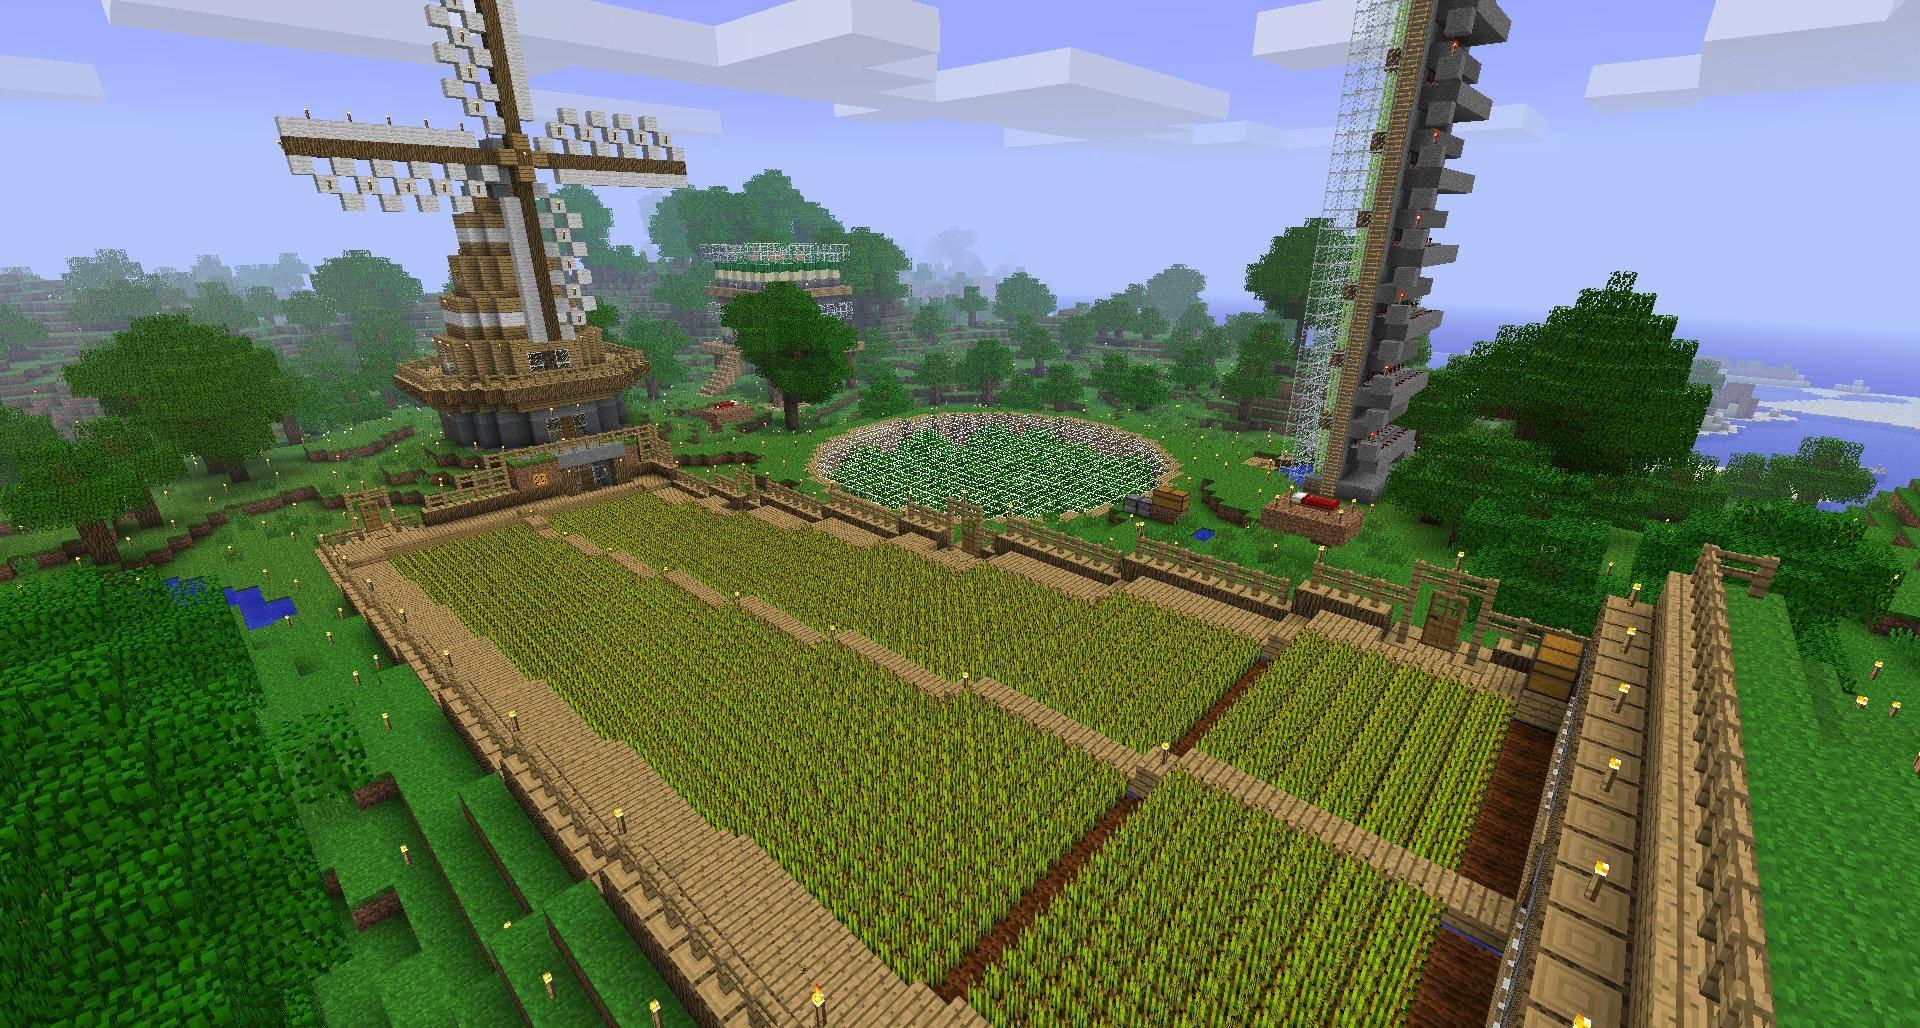 How to Farm in Minecraft - Minecraft mod